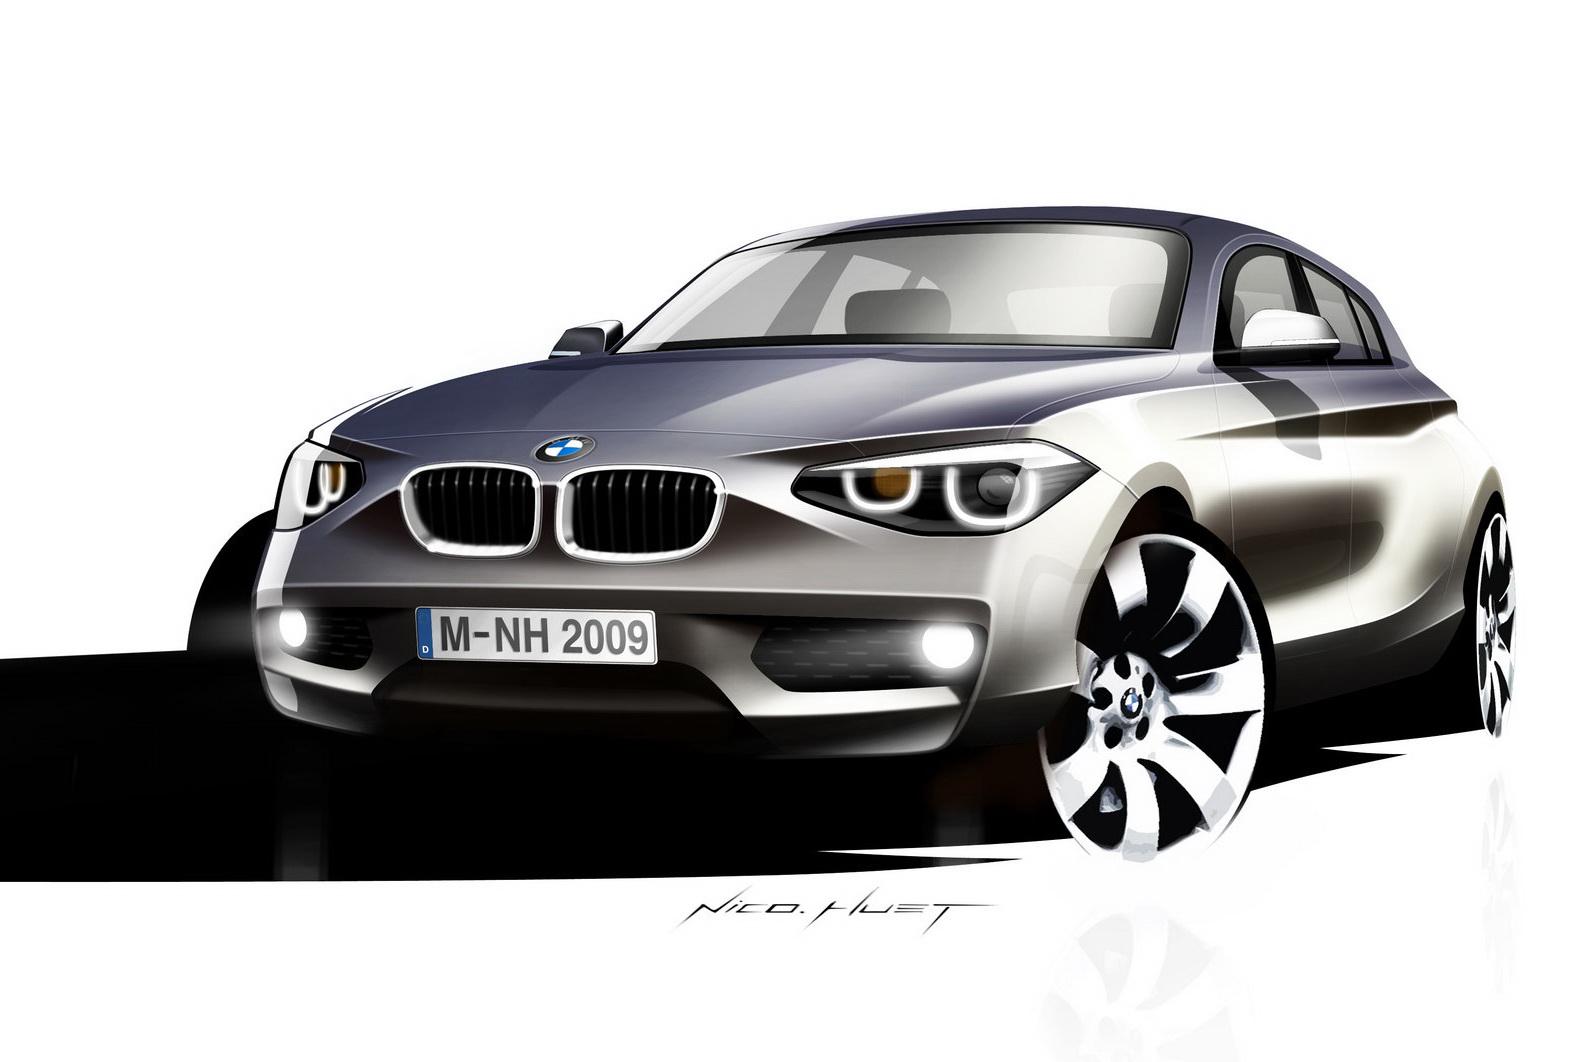 http://1.bp.blogspot.com/-QMwDrly7gEg/TevN2JaytWI/AAAAAAAAARI/6qxAbl1jdLs/s1600/2012-BMW-Series-1.JPG